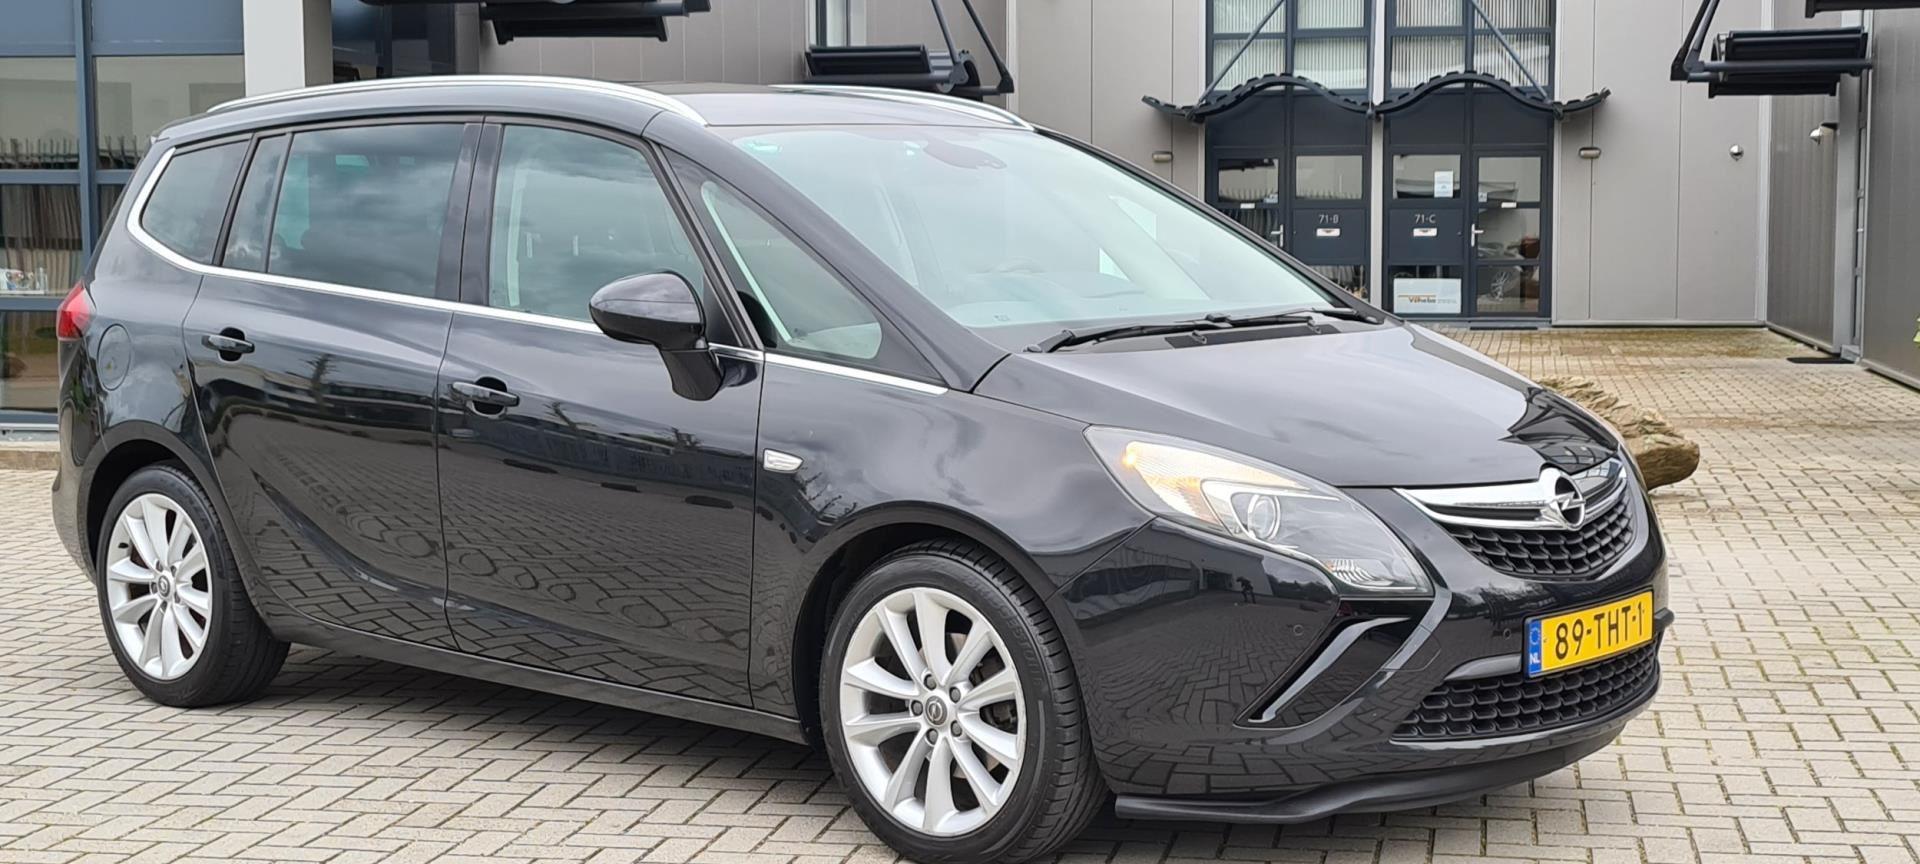 Opel Zafira Tourer occasion - Weerterveld Auto's